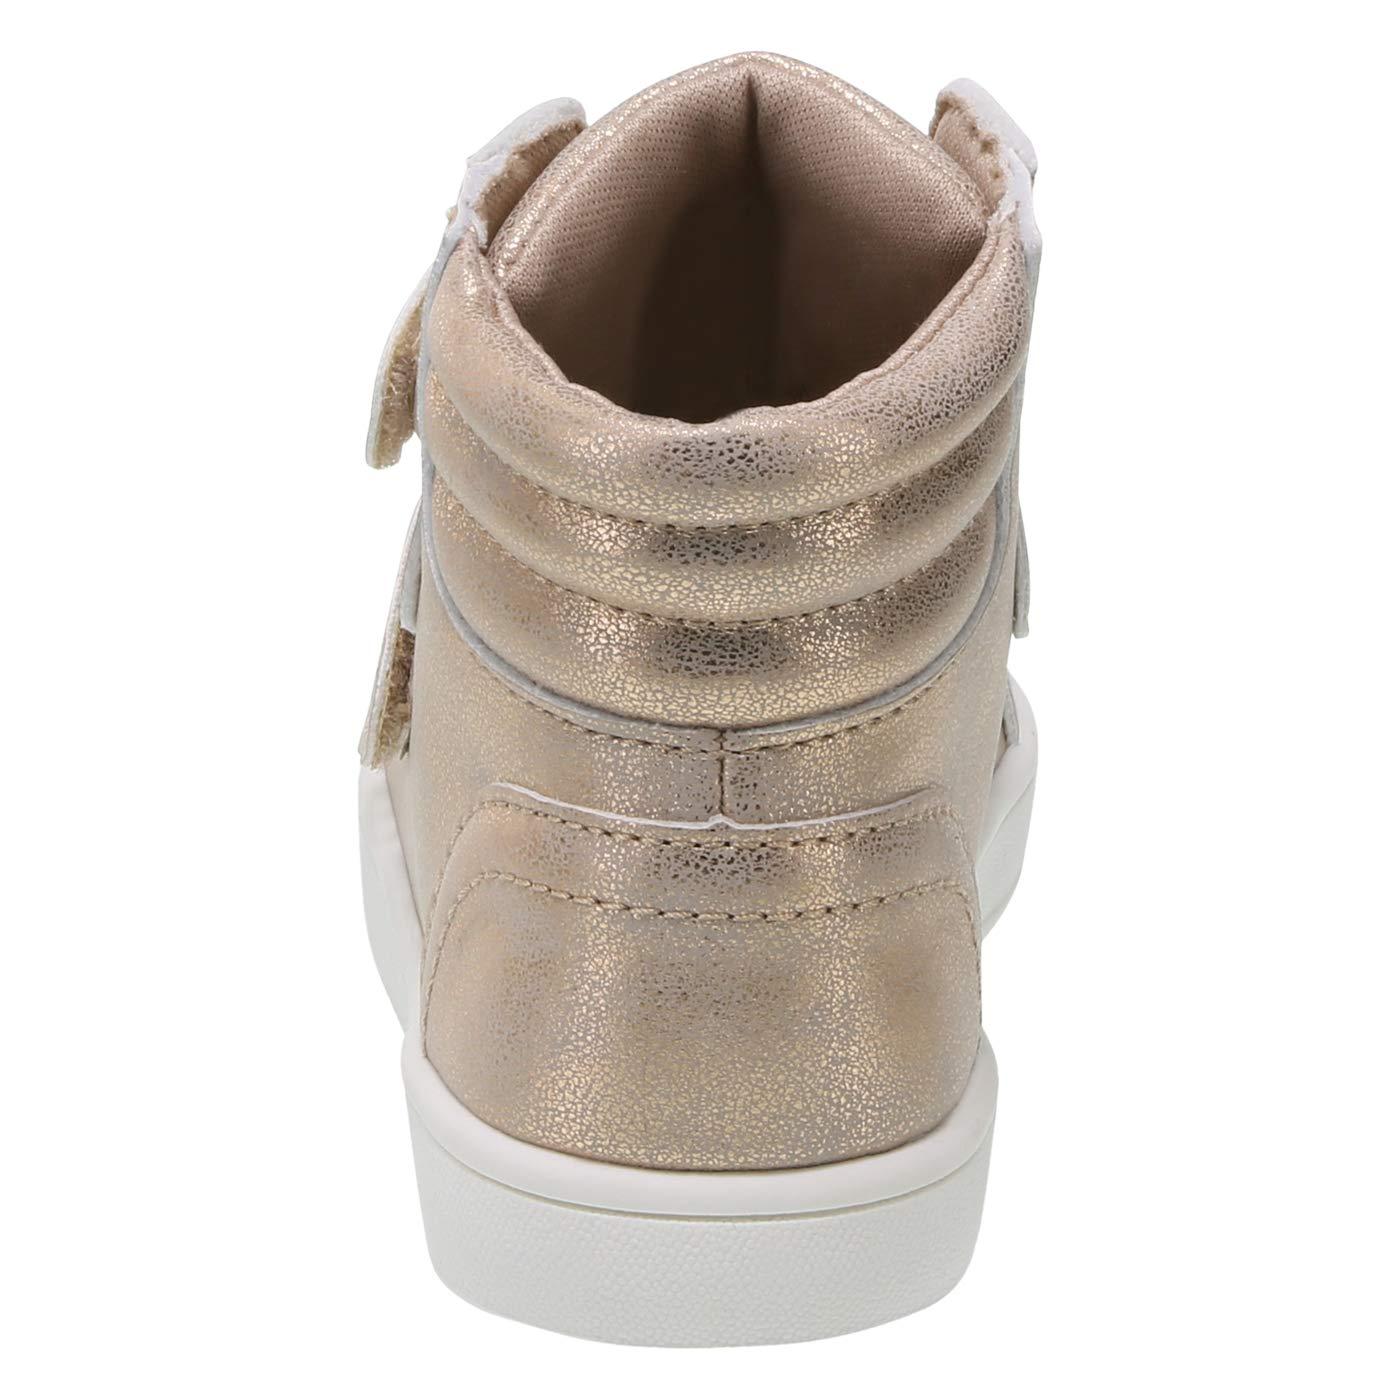 Brash Girls Phoenix Toddler High-Top Sneaker 079943-Parent